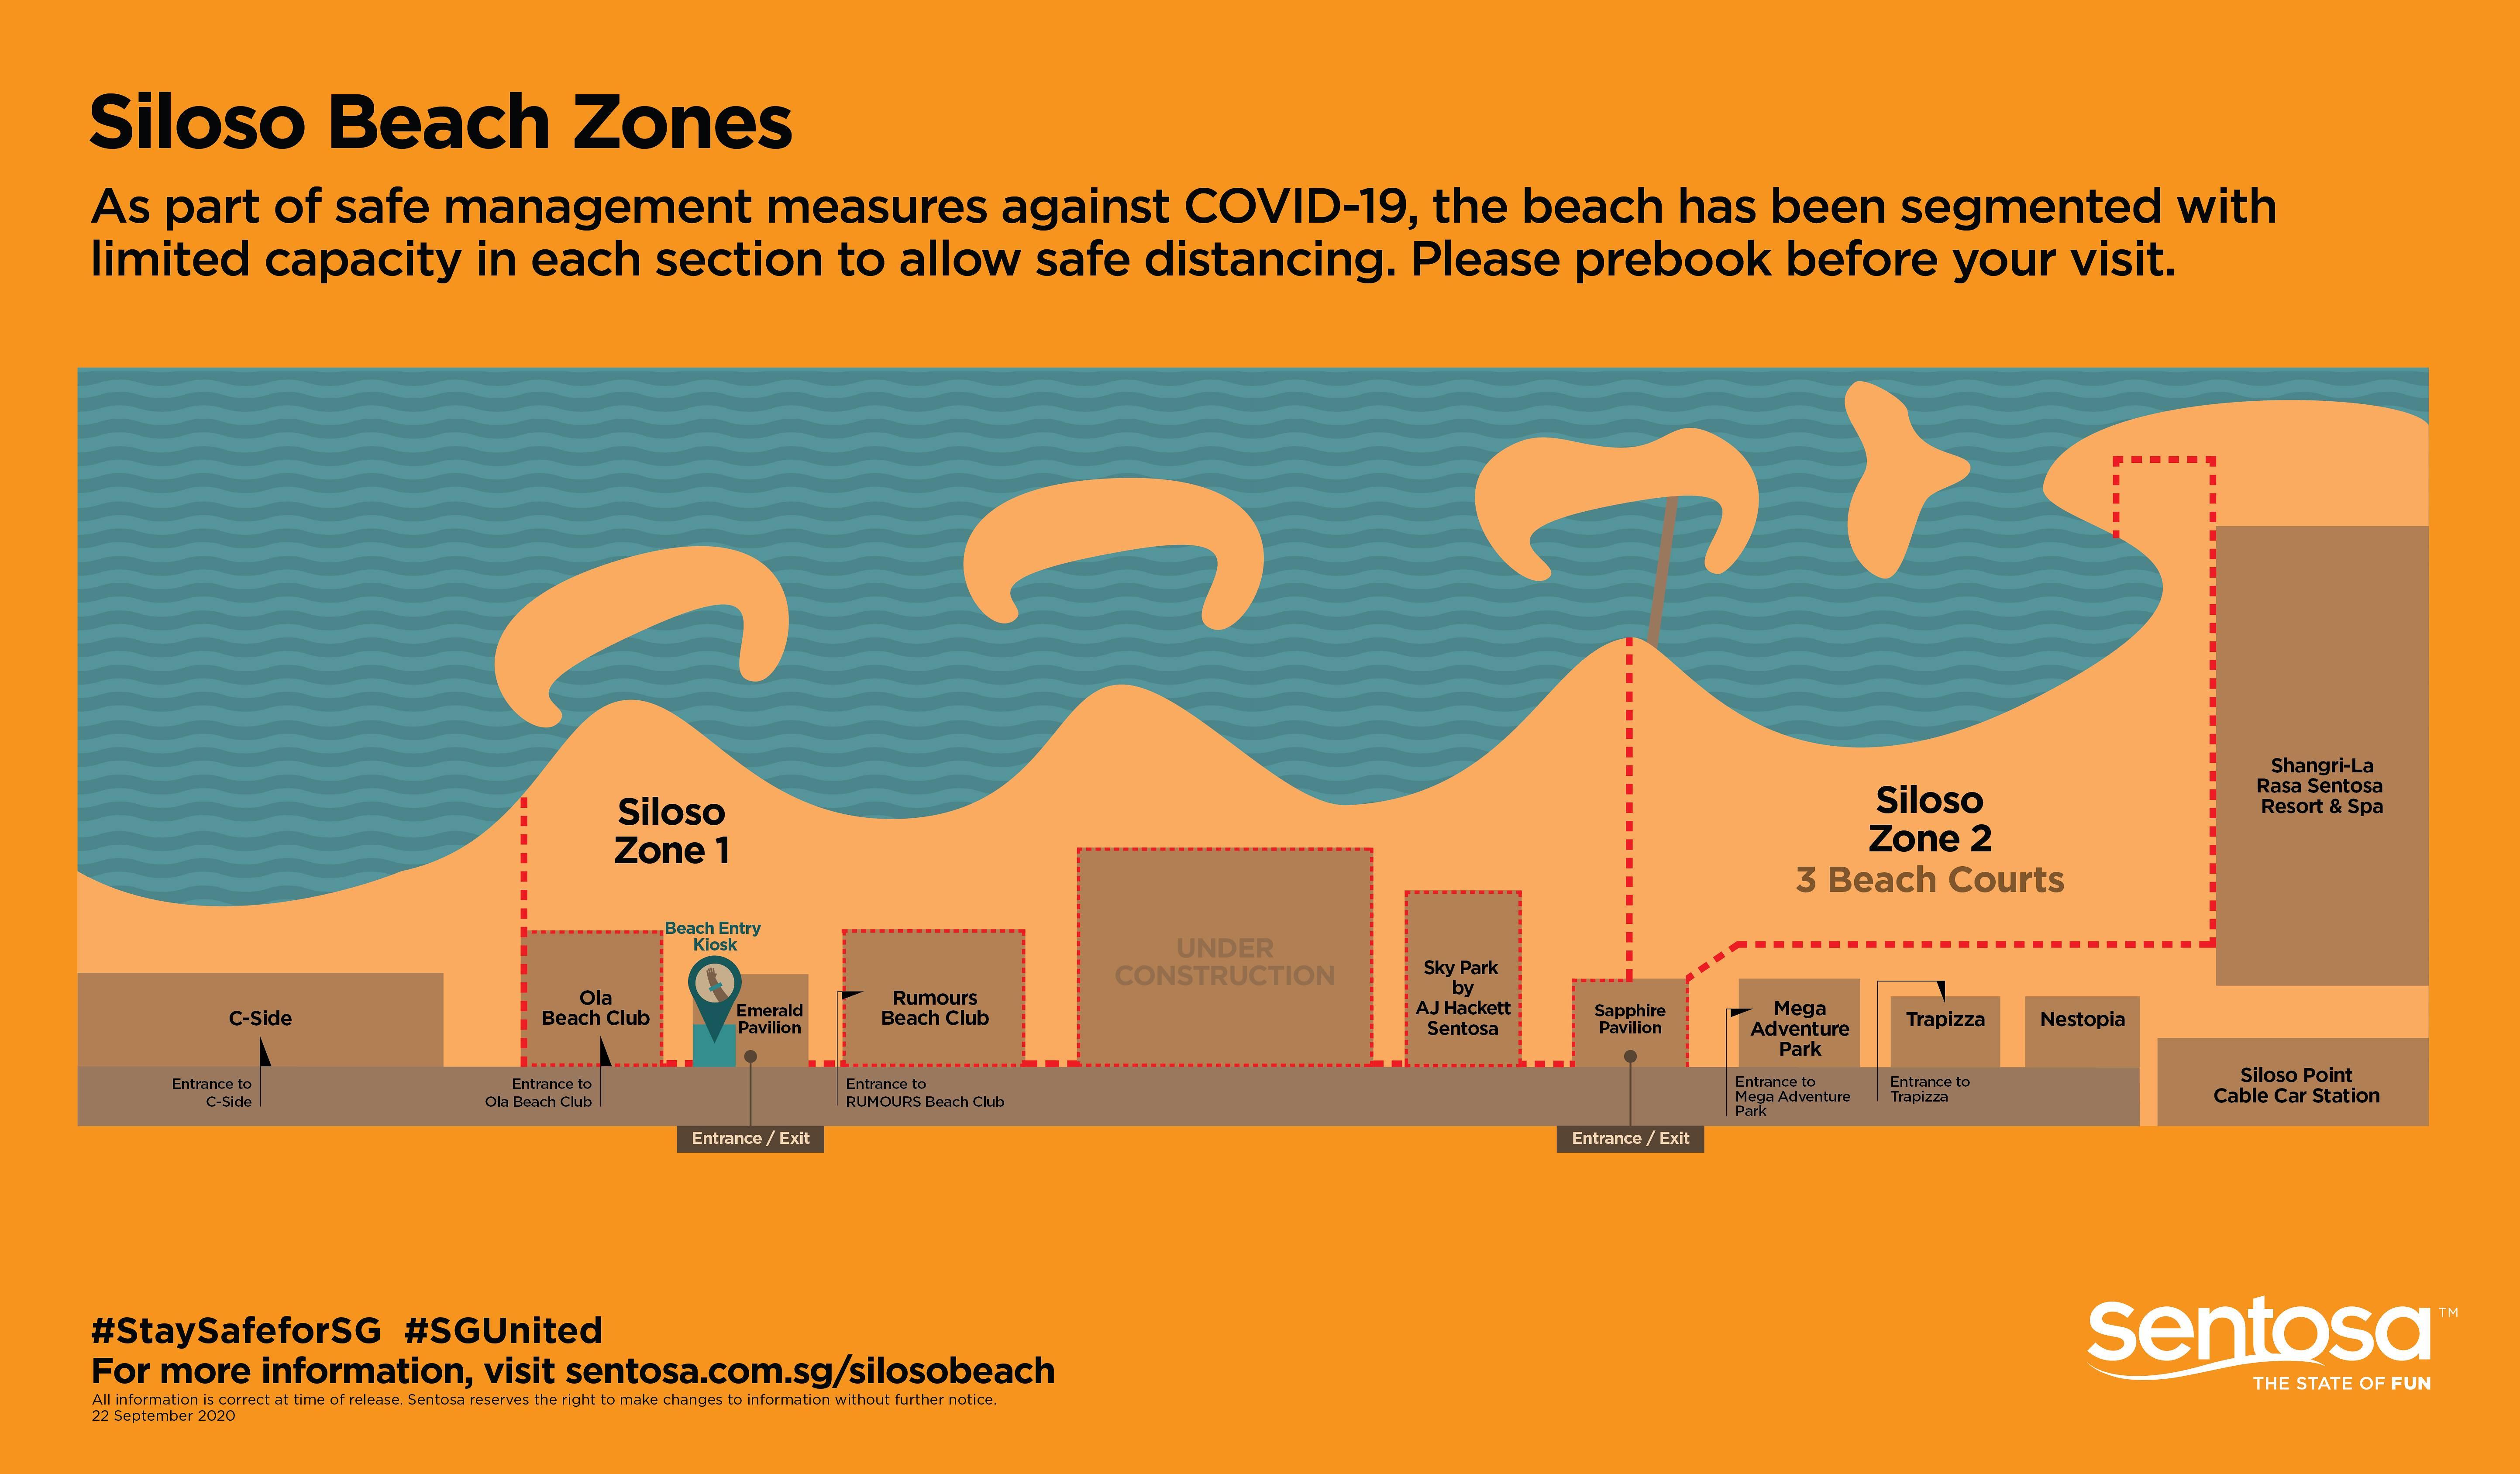 sentosa-siloso-beach-zones